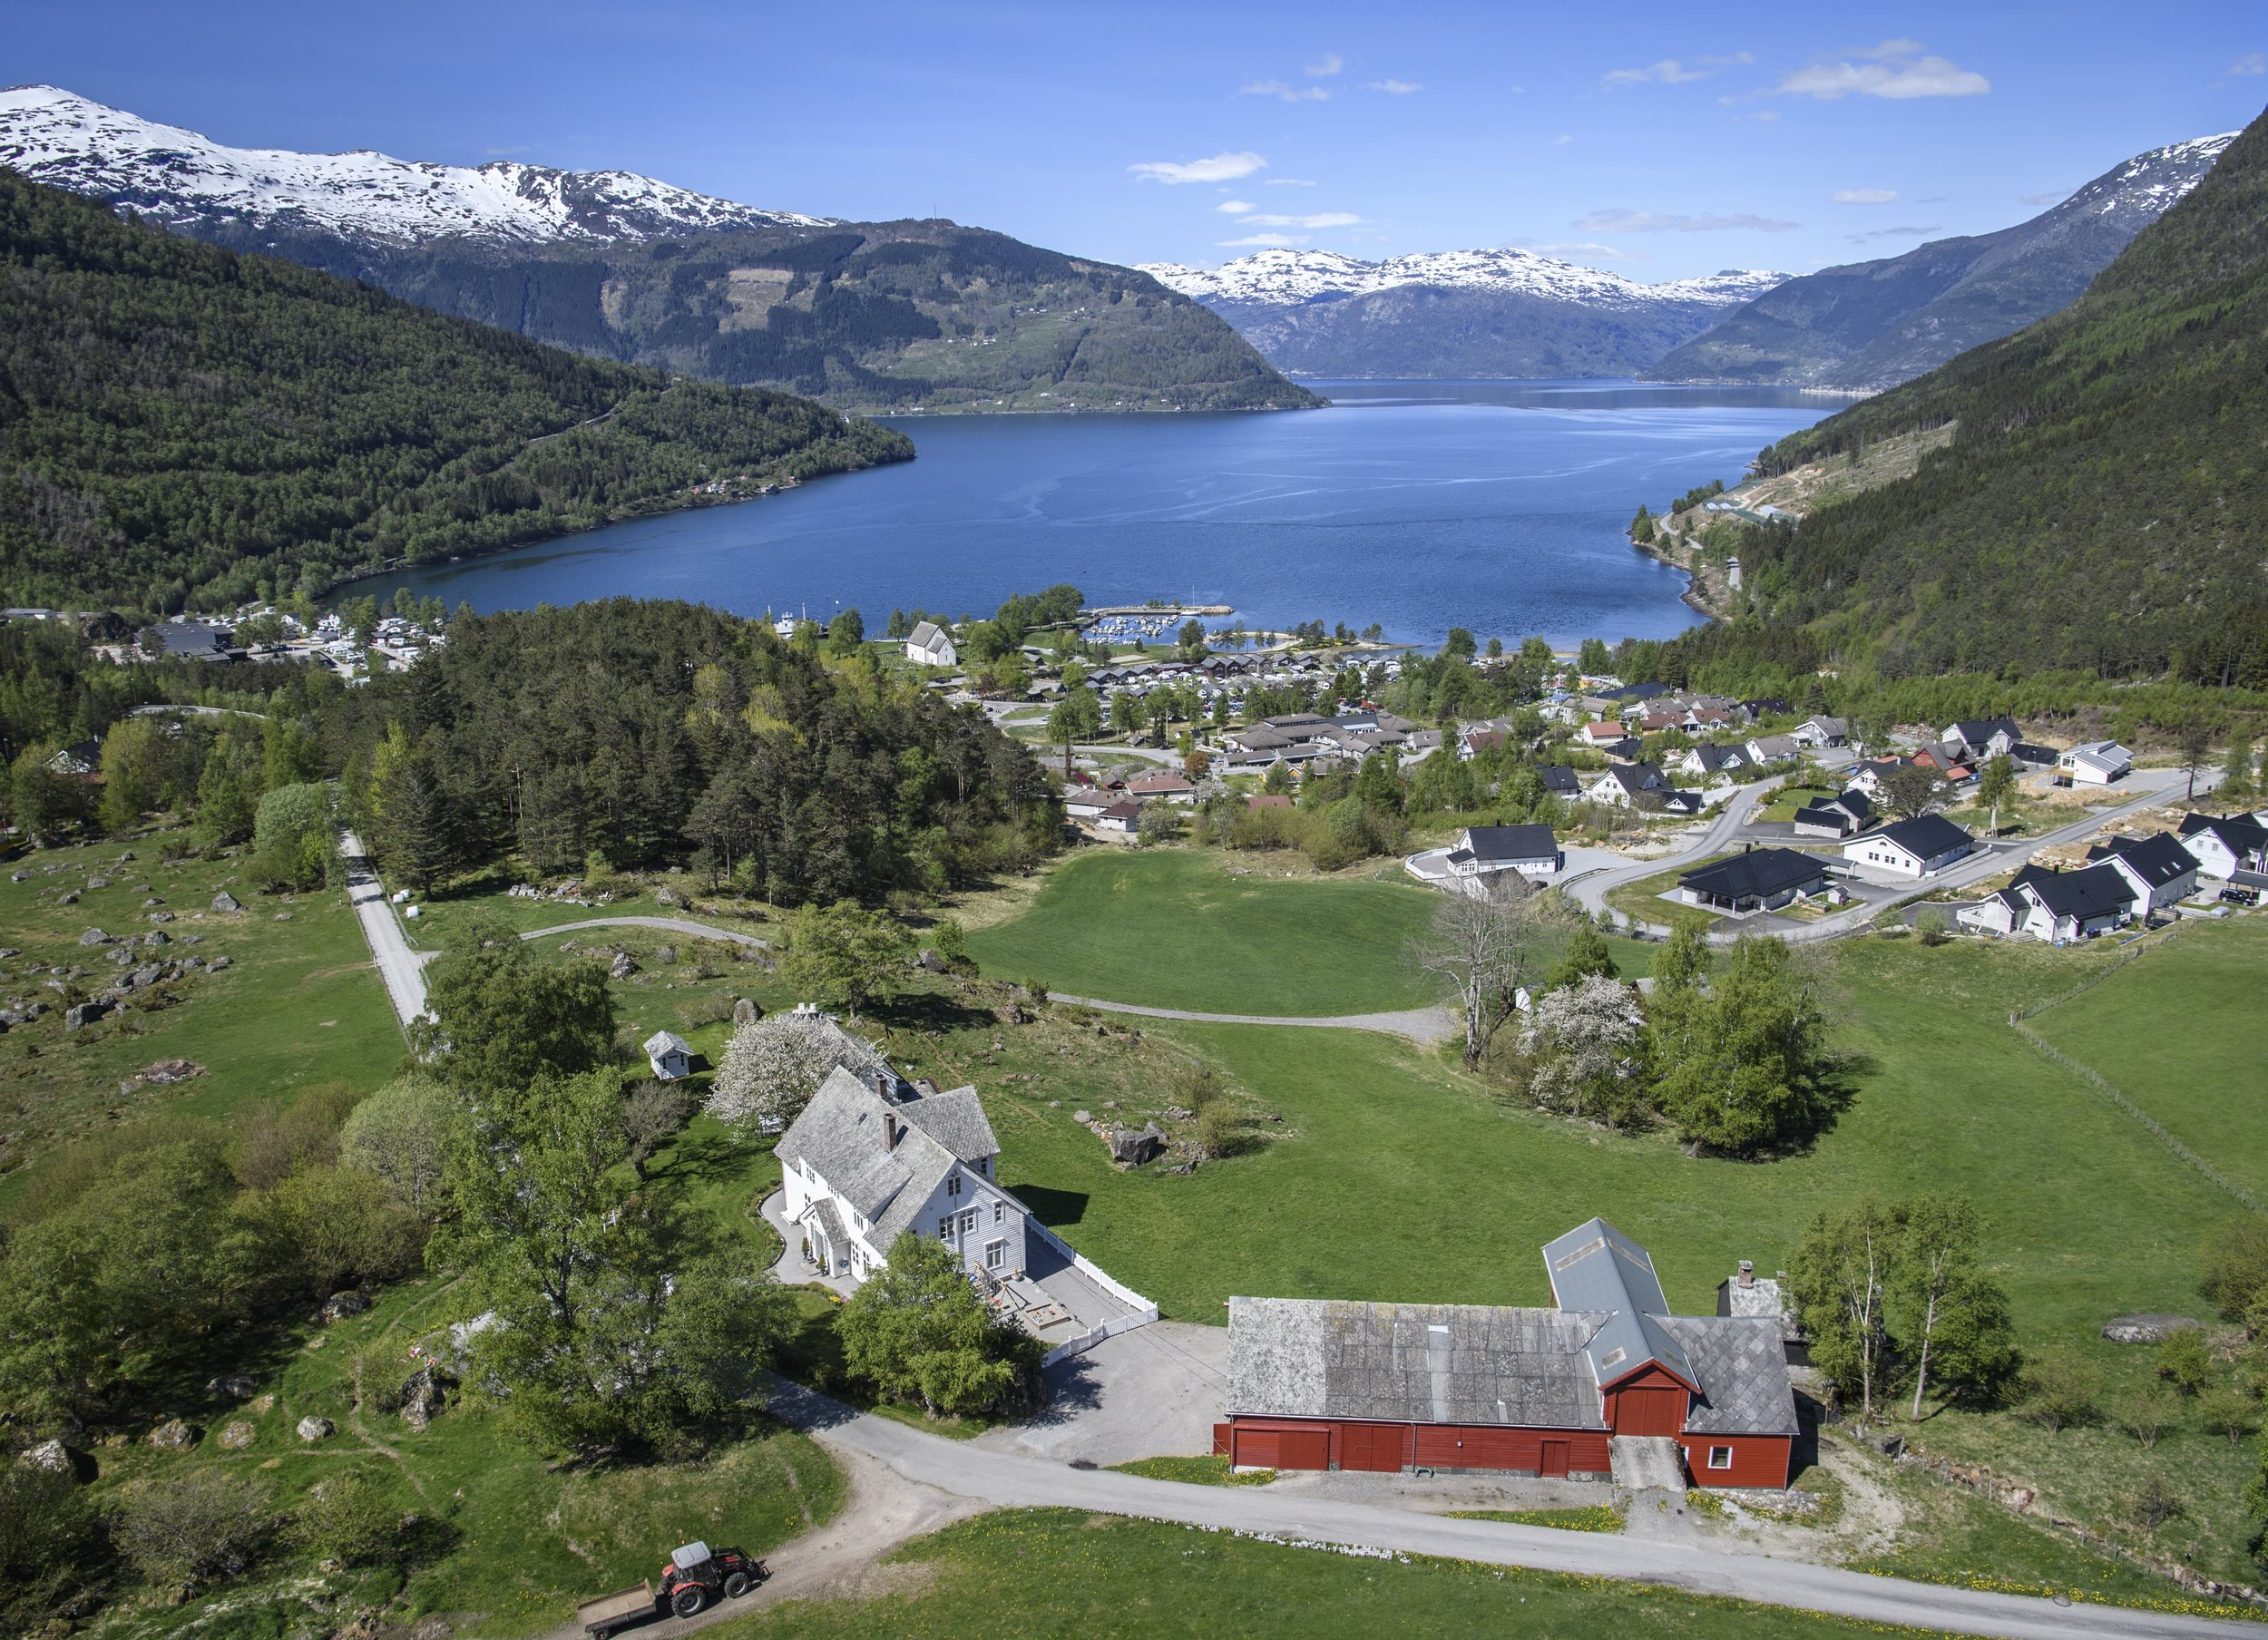 Huse Kinsarvik Overblikk.jpg